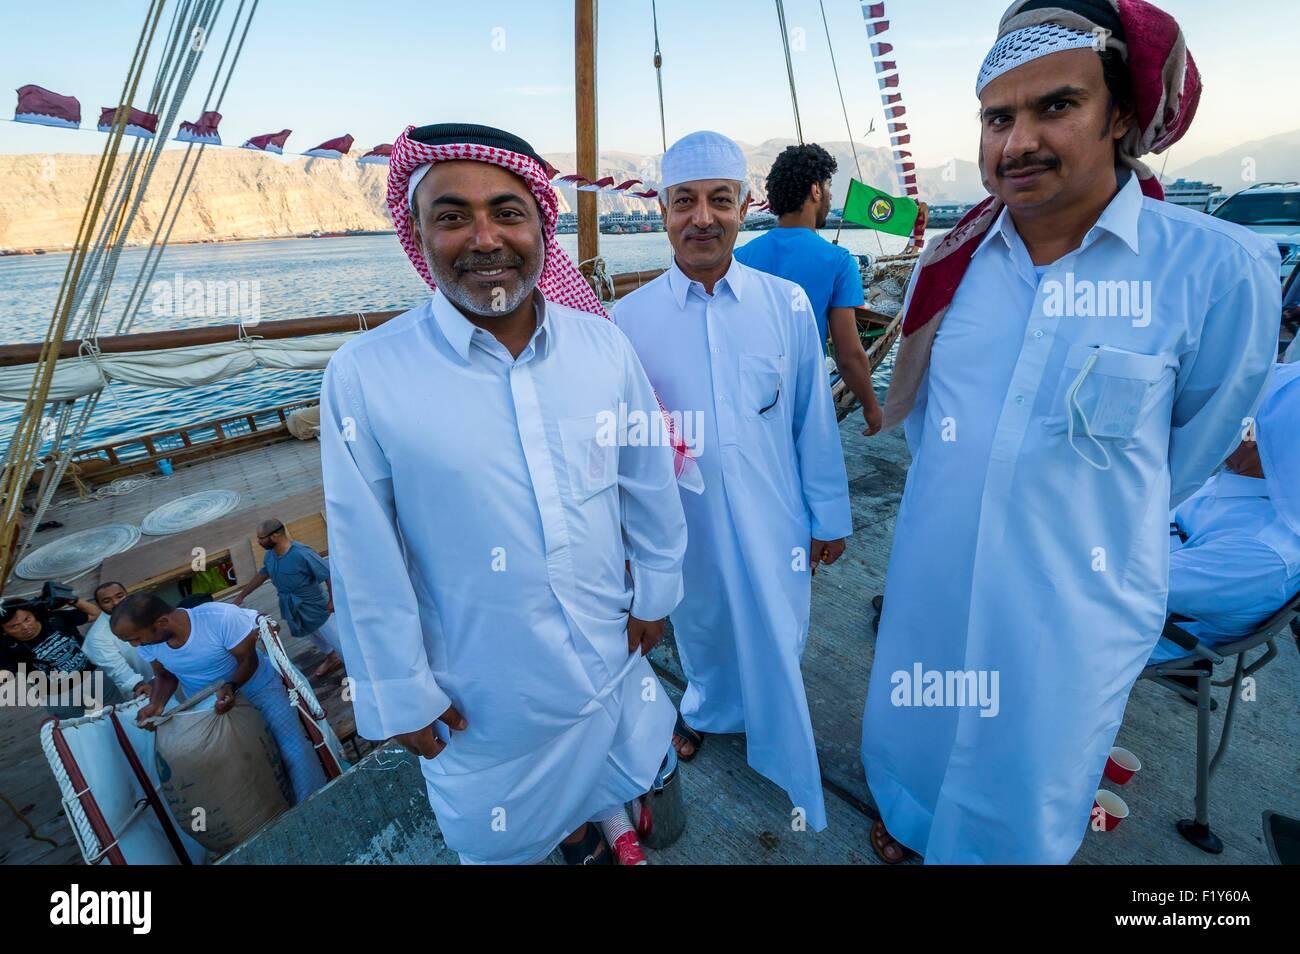 Oman, Khasab, Musandam, the port, Qataris cruising aboard an old dhow - Stock Image